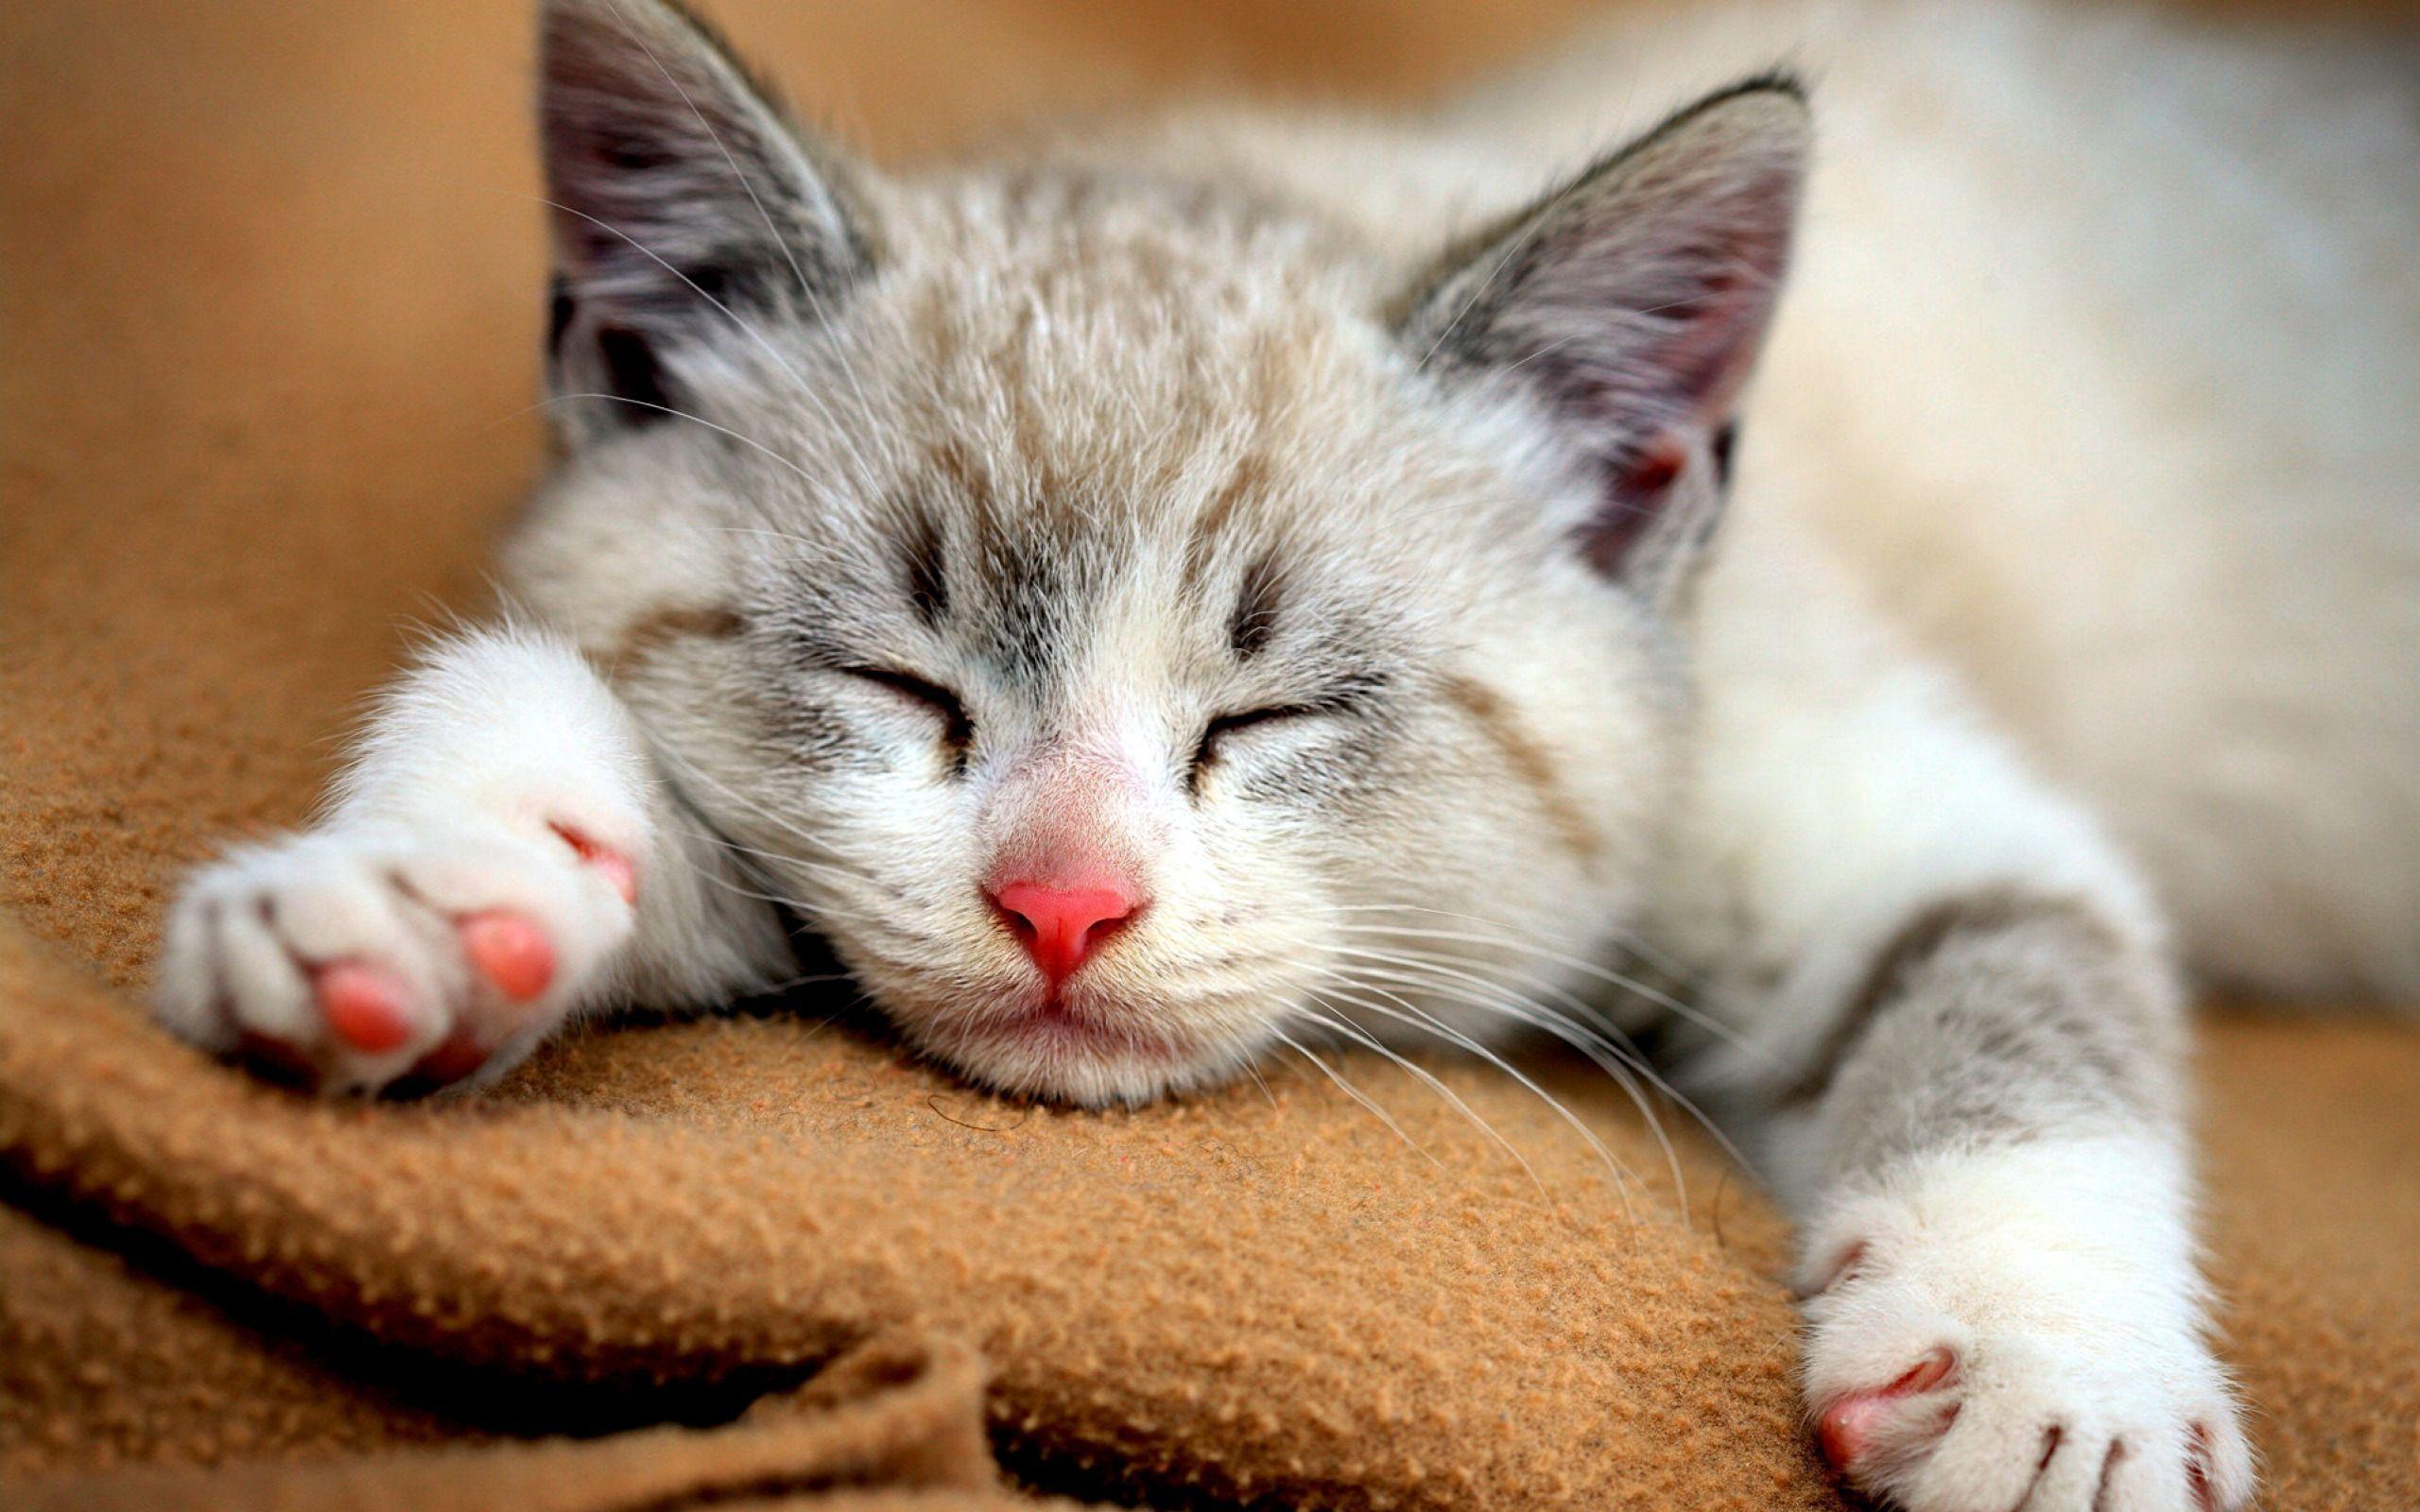 2560x1600 Cute Cat Wallpaper Full Widescreen 60401